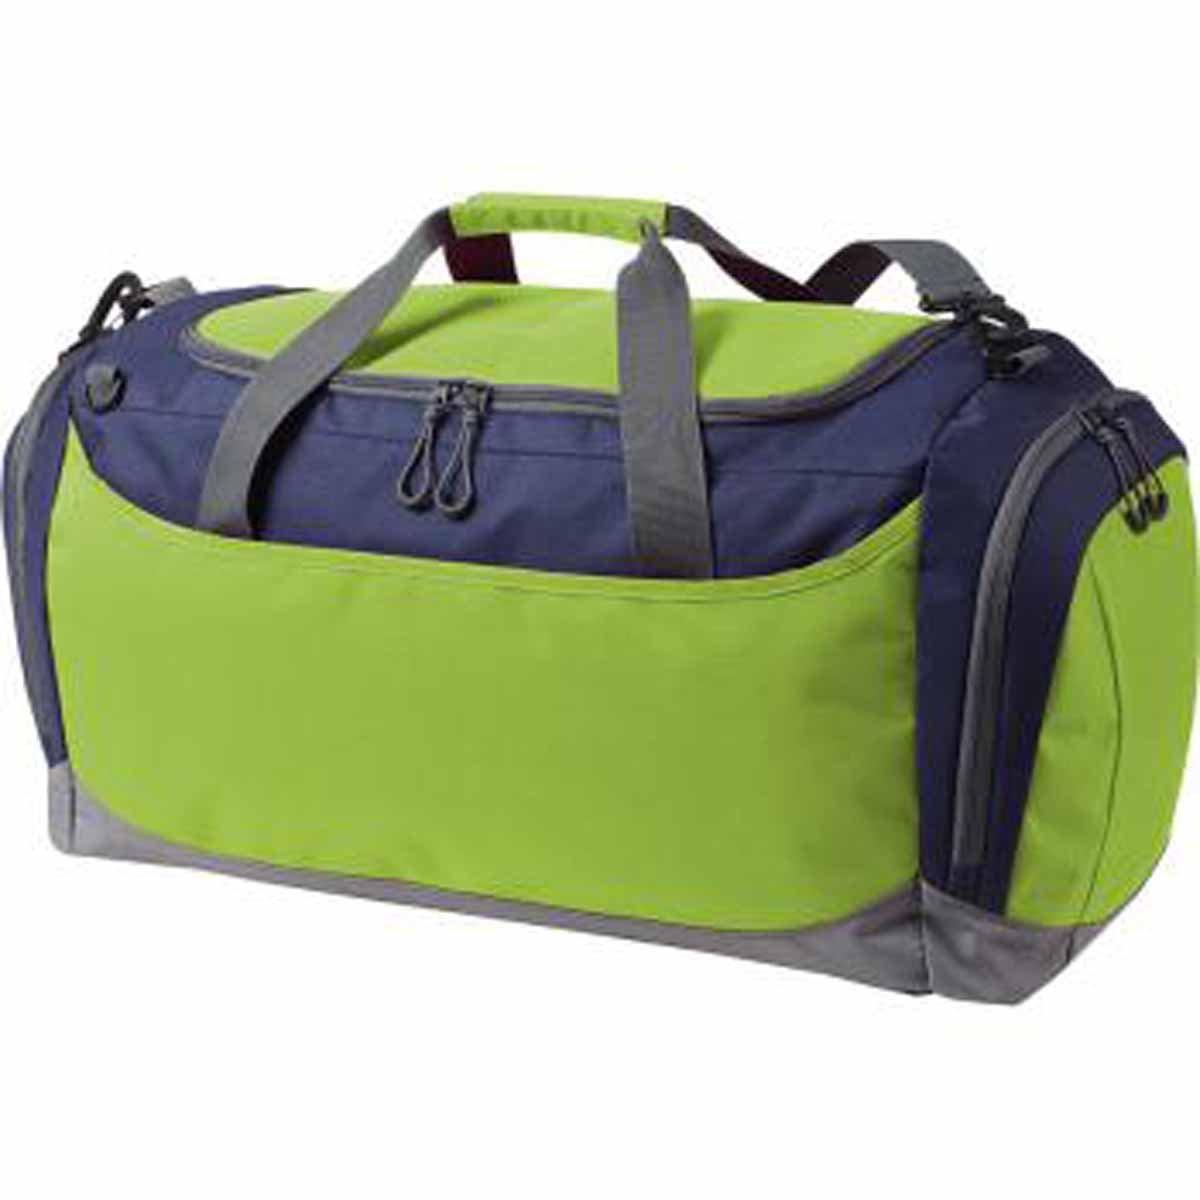 HALFAR - sac de sport - sac de voyage - 1809104 (Rouge) I4Z906cGG